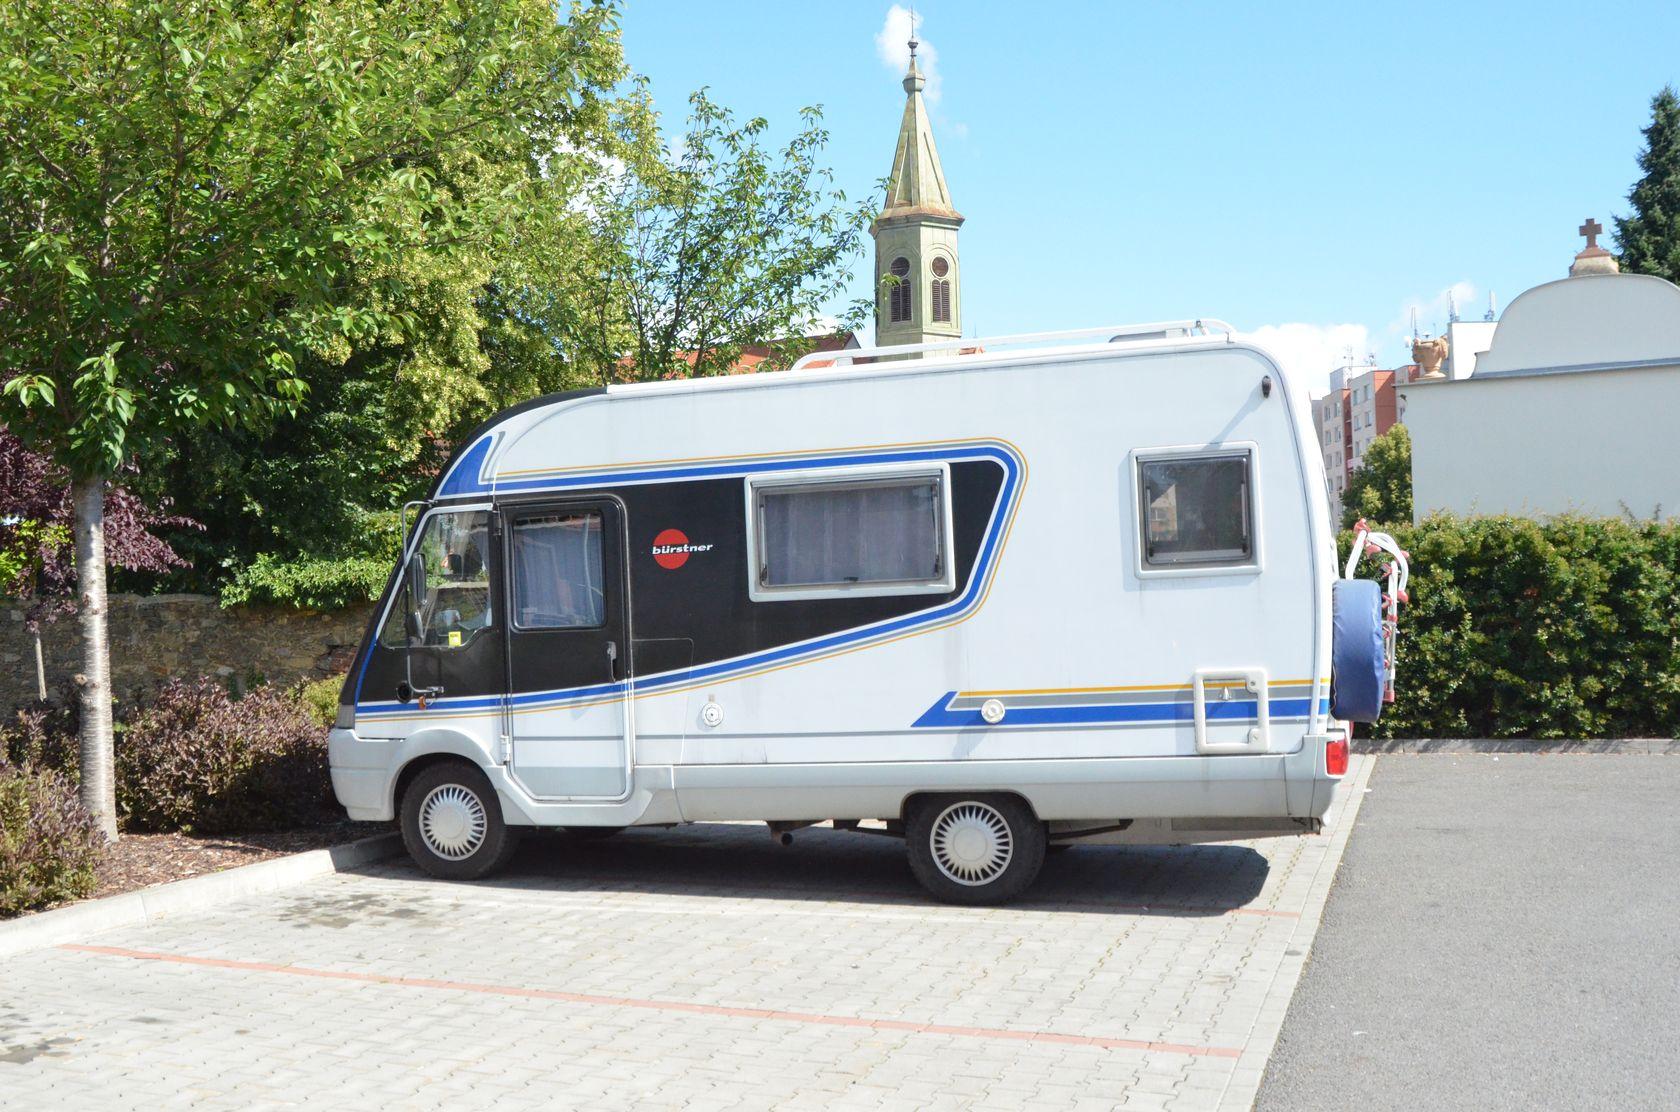 Horažďovice parking